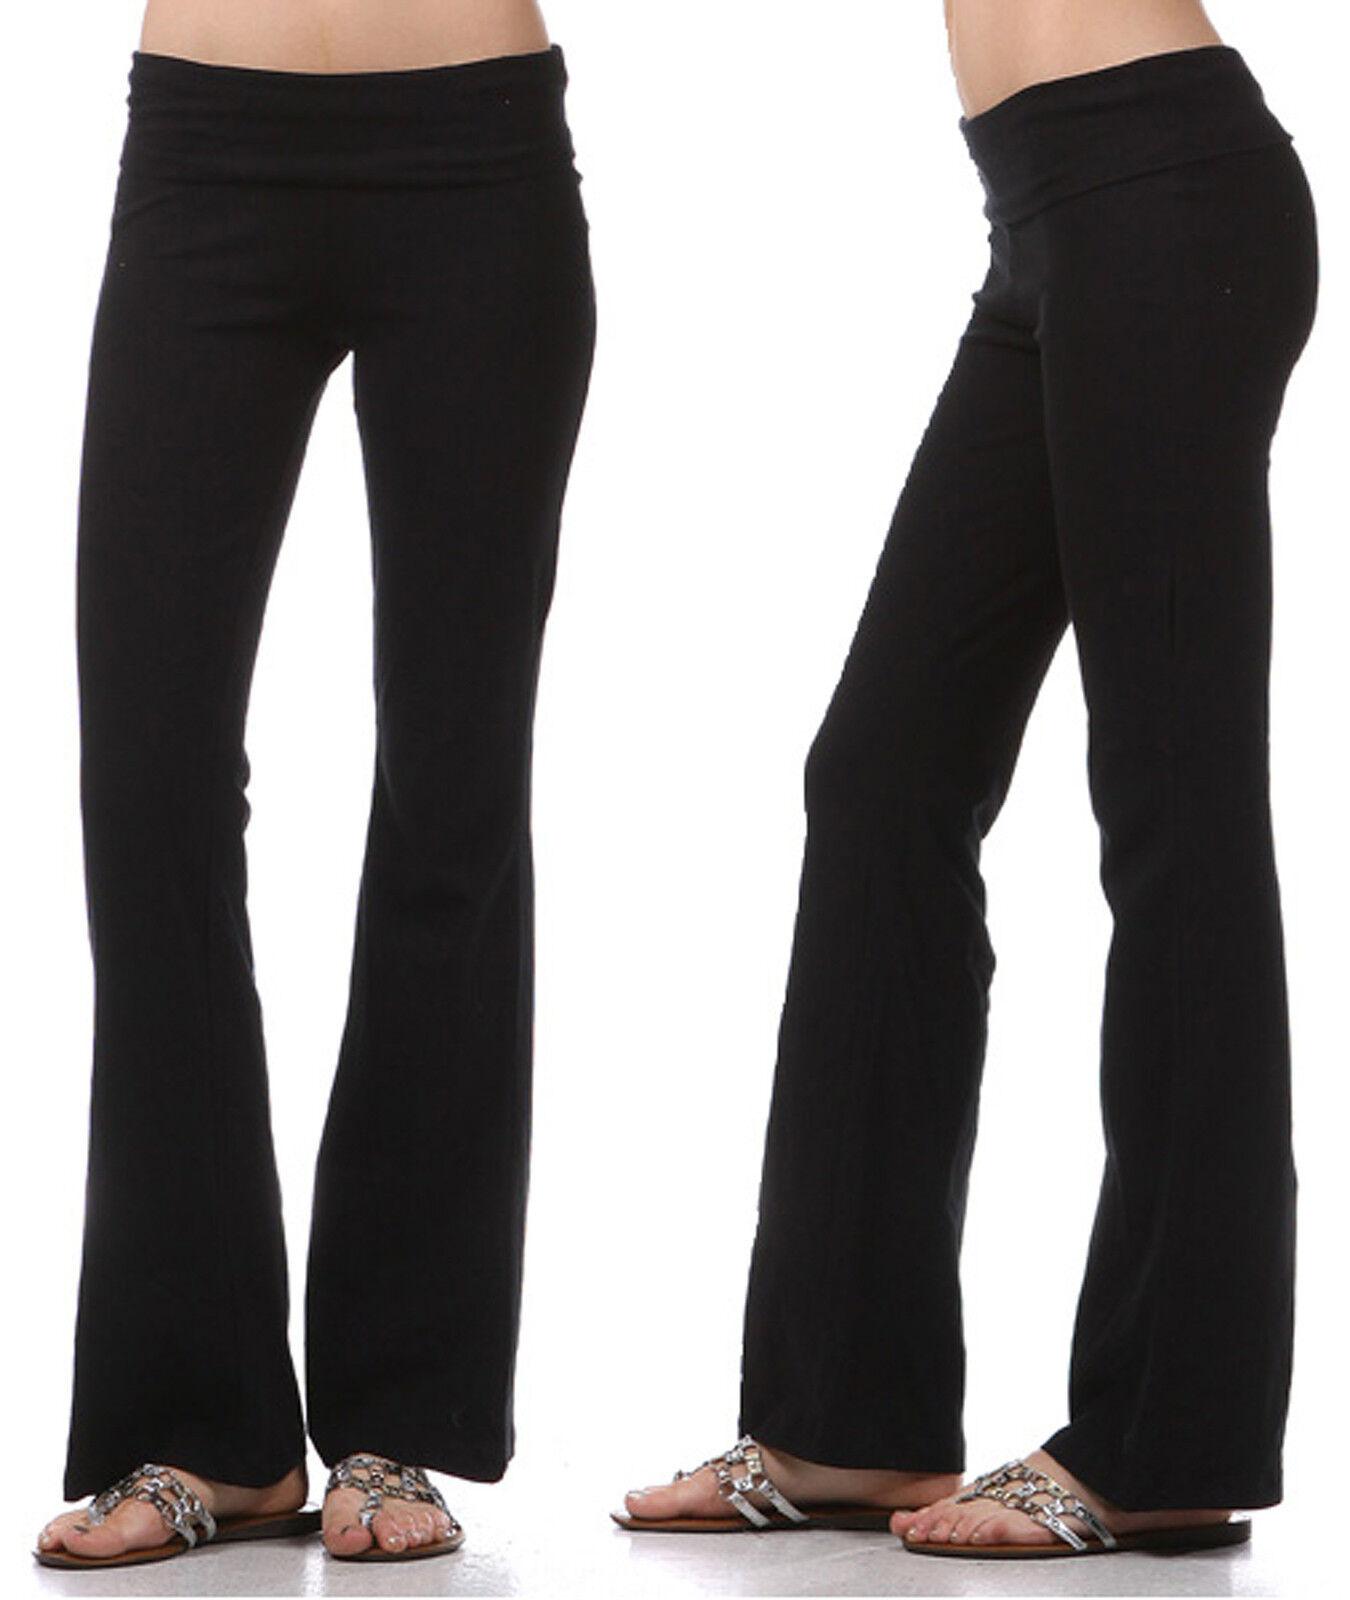 yoga pants basic long fitness foldover waist